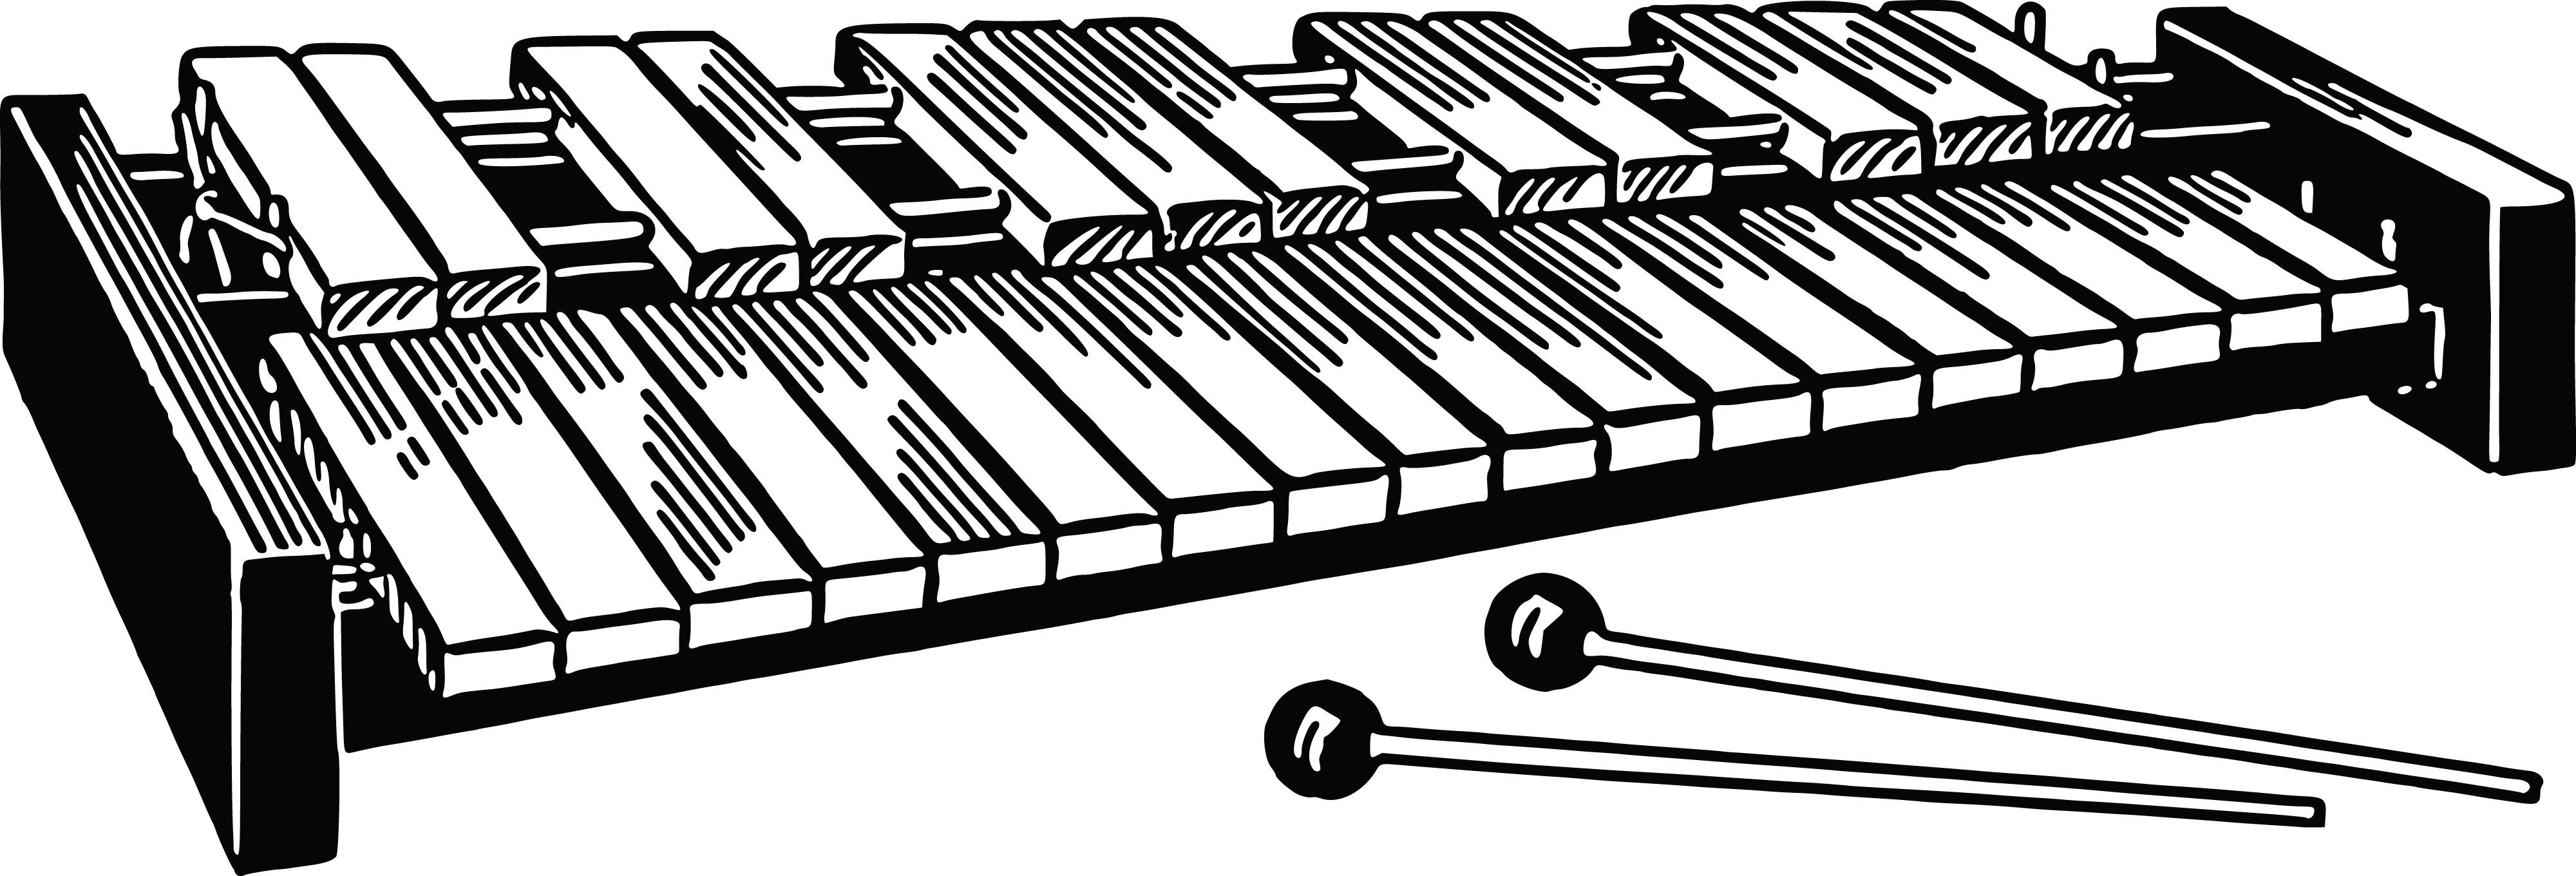 clipartlook. Xylophone clipart clip art